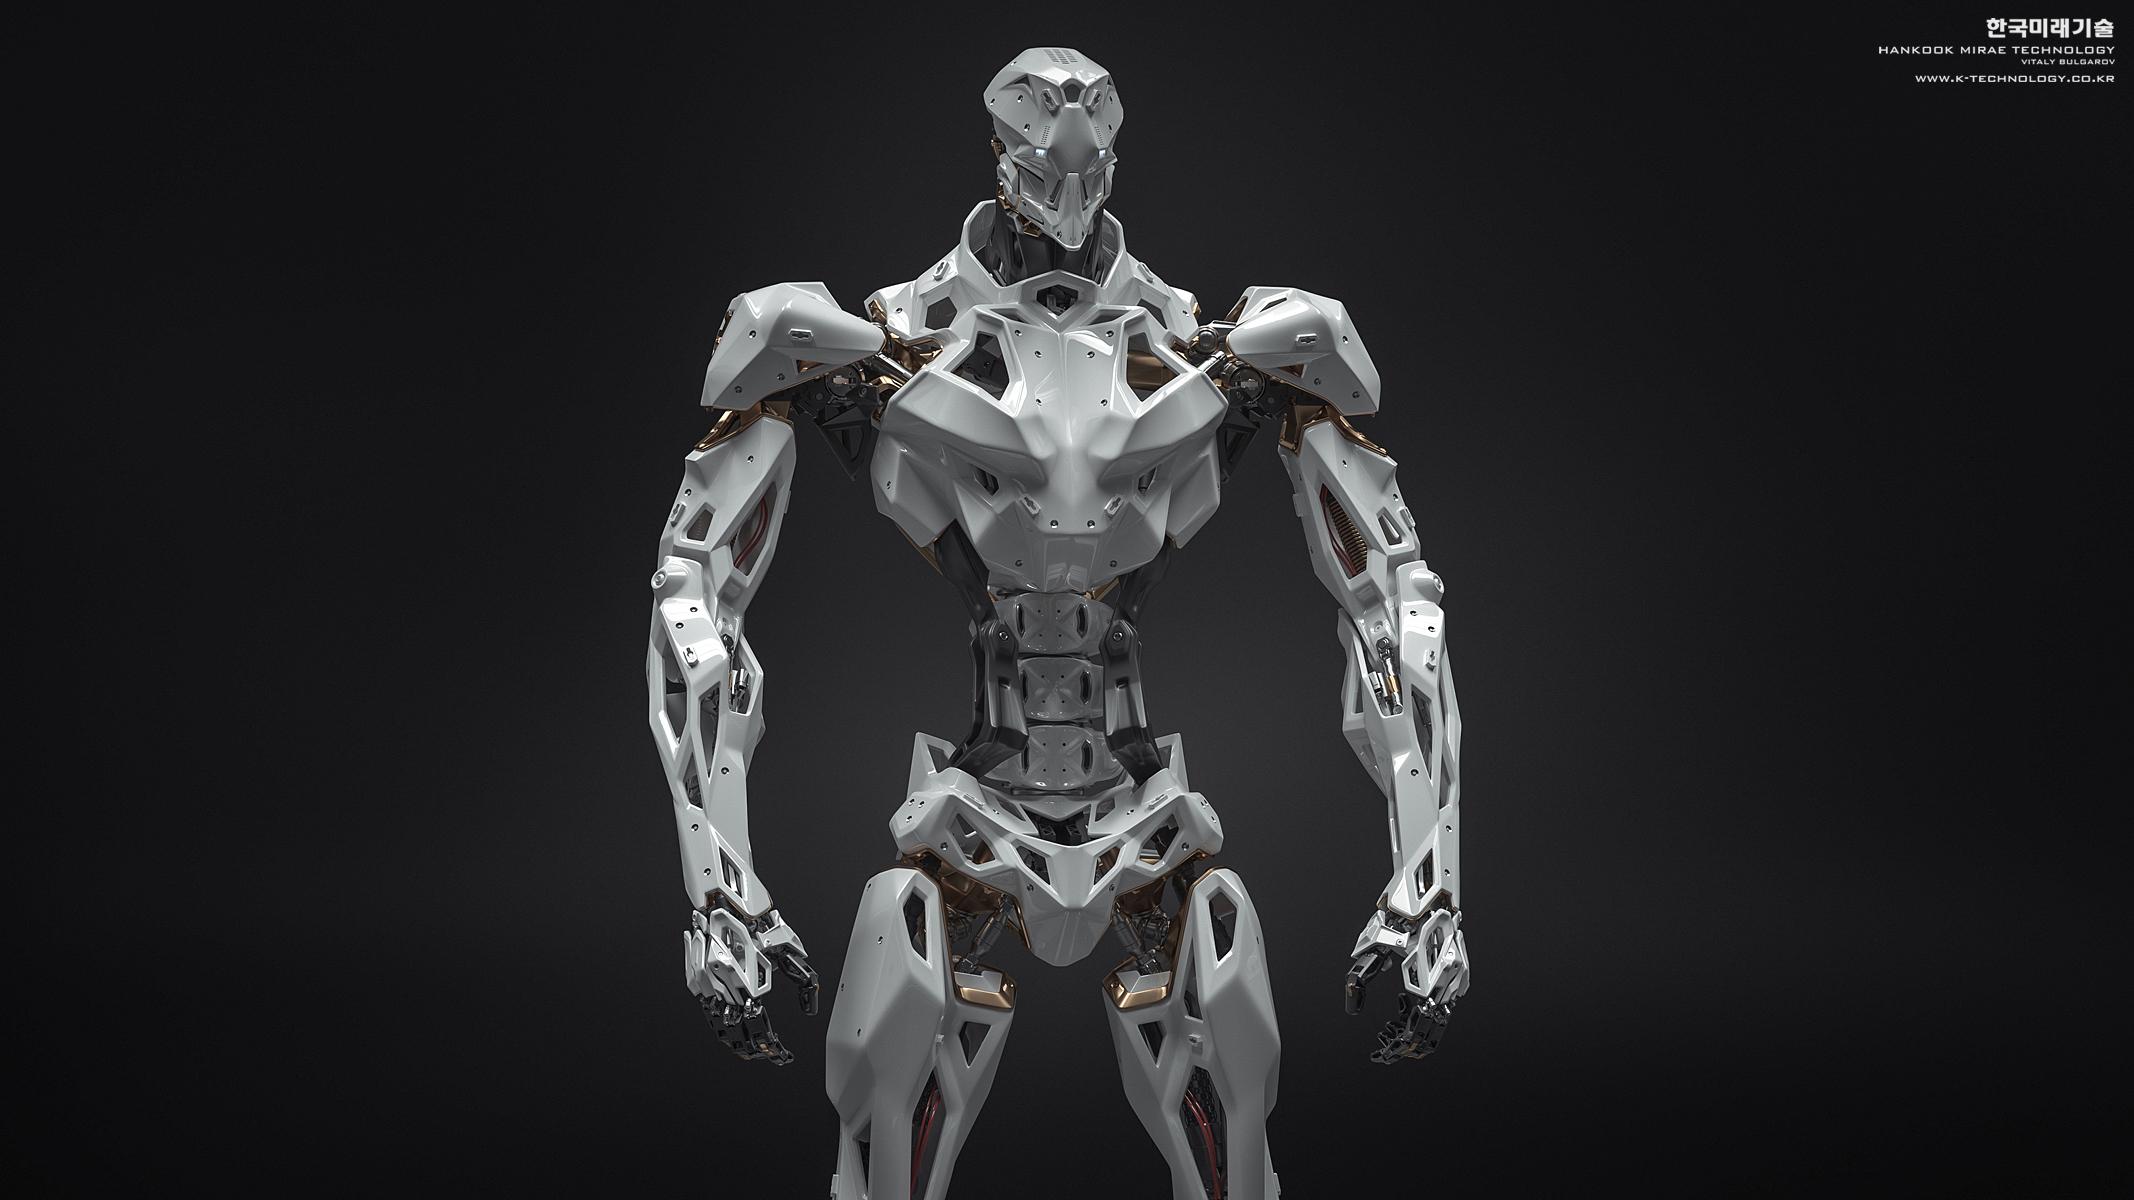 KFT_2.Xm_RobotDesign_ (13 of 29).jpg